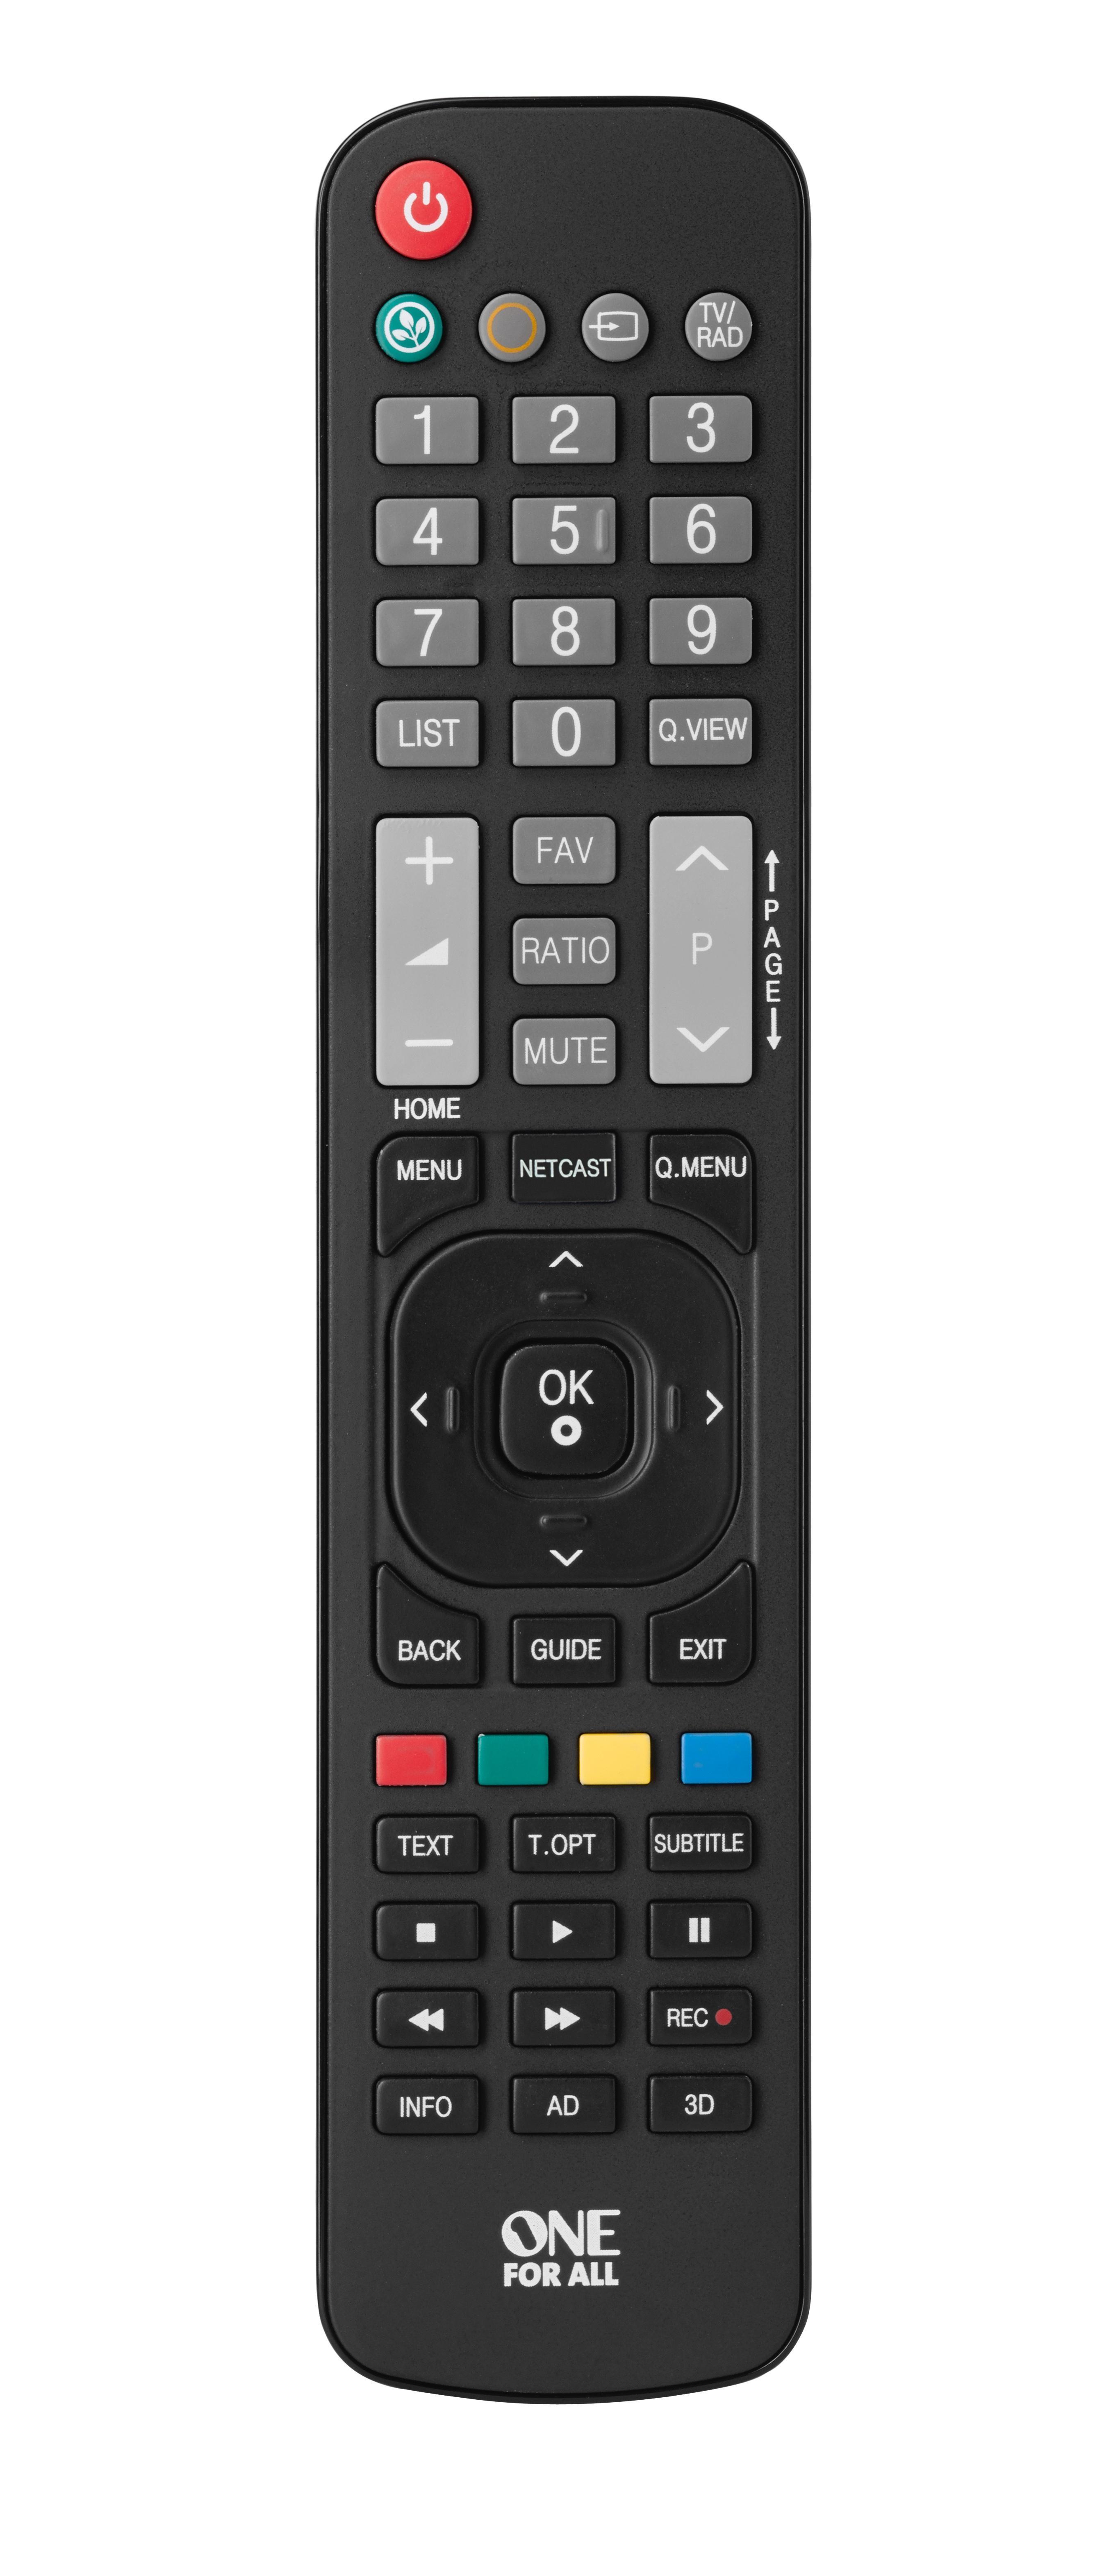 One For All URC 1911 telecomando IR Wireless TV Pulsanti